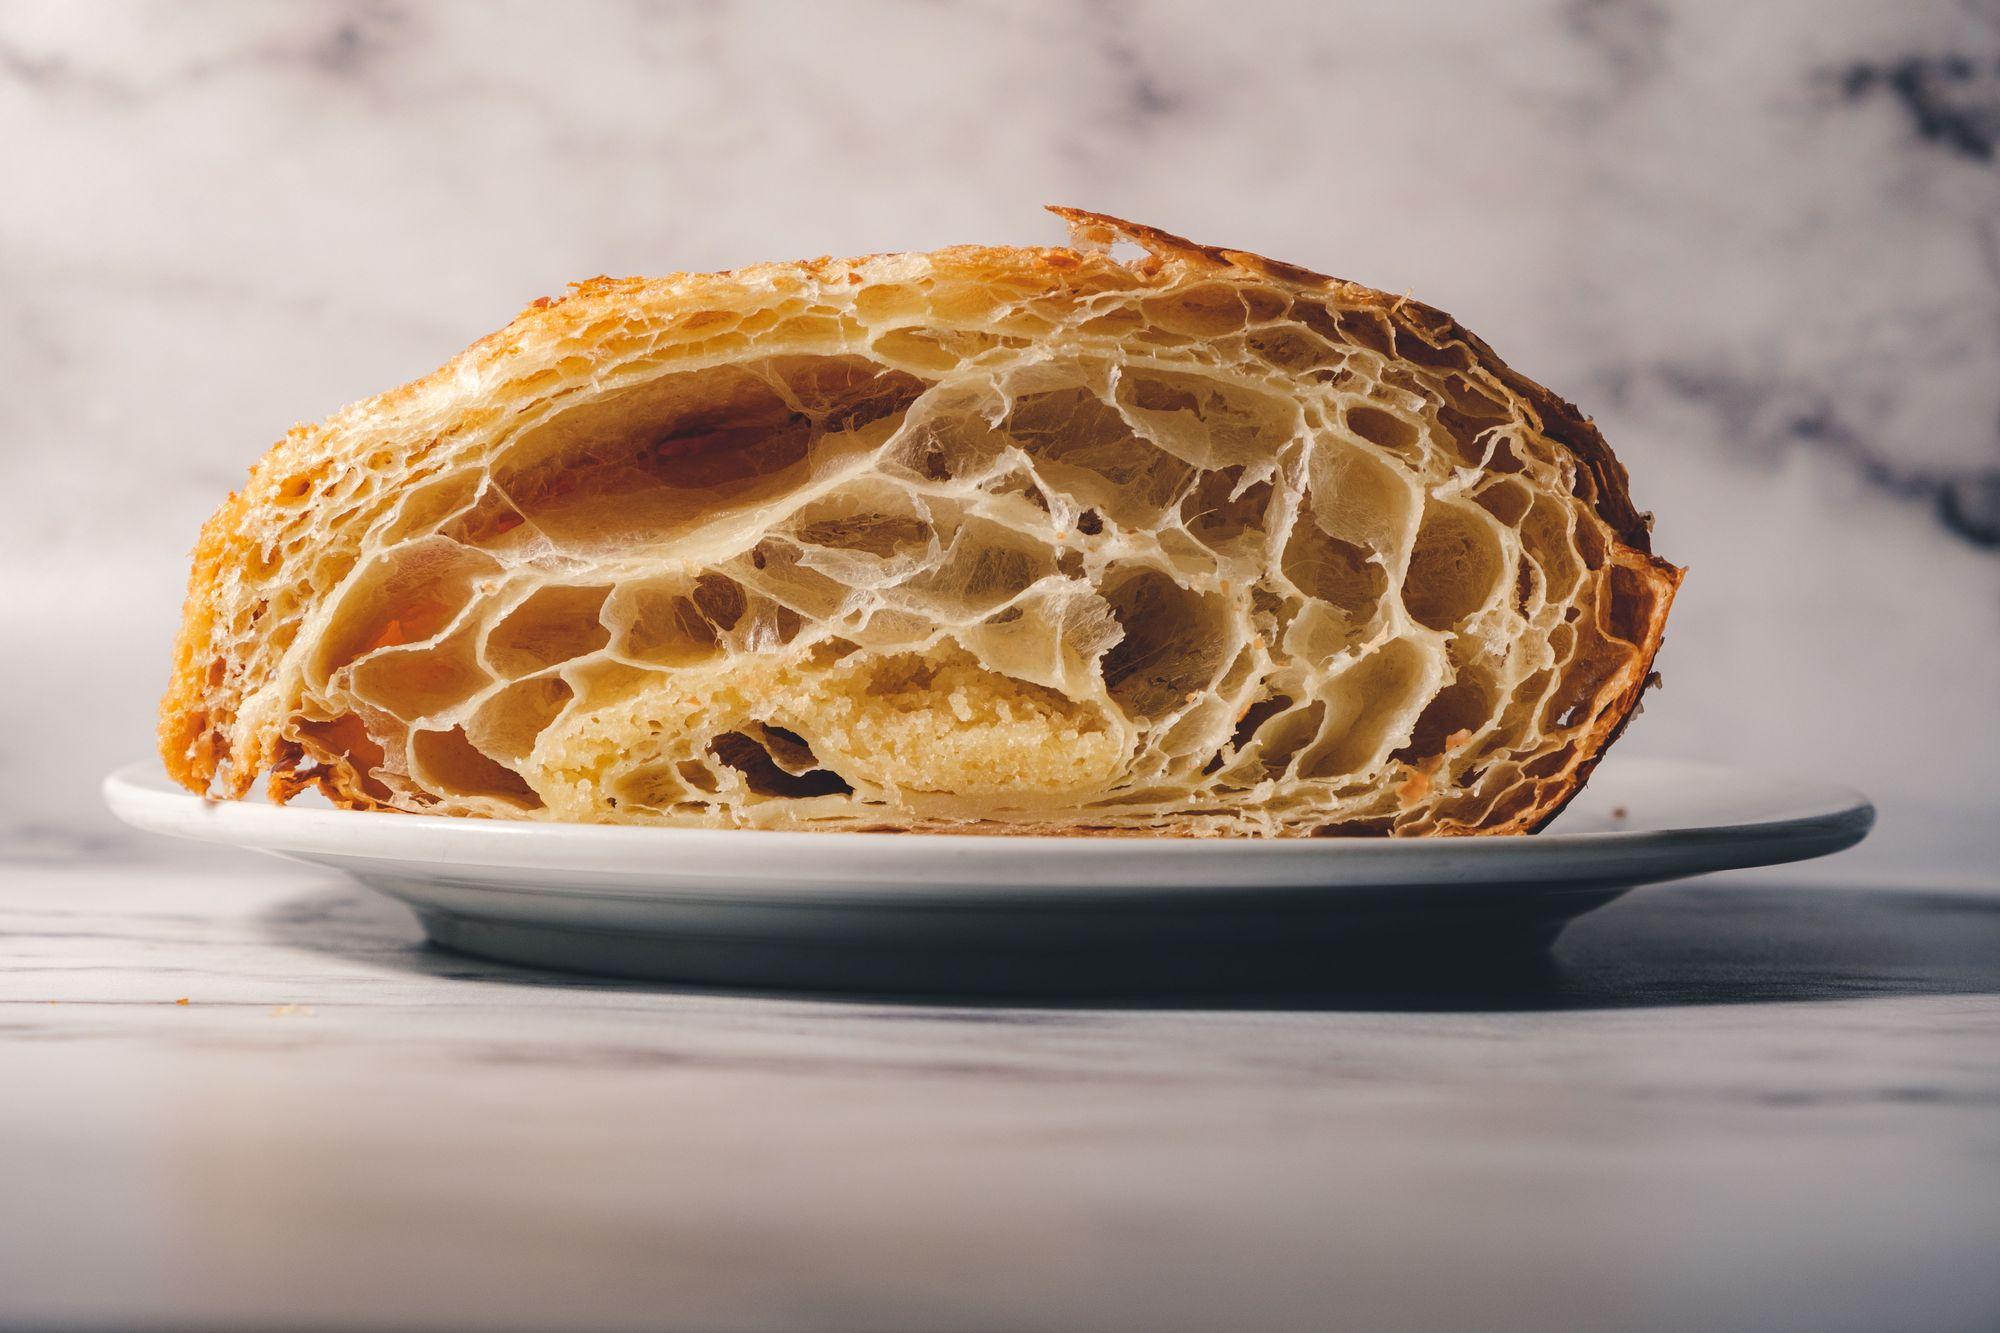 Little Fox Bakehouse Almond Croissant ($3.75) - Cross Section